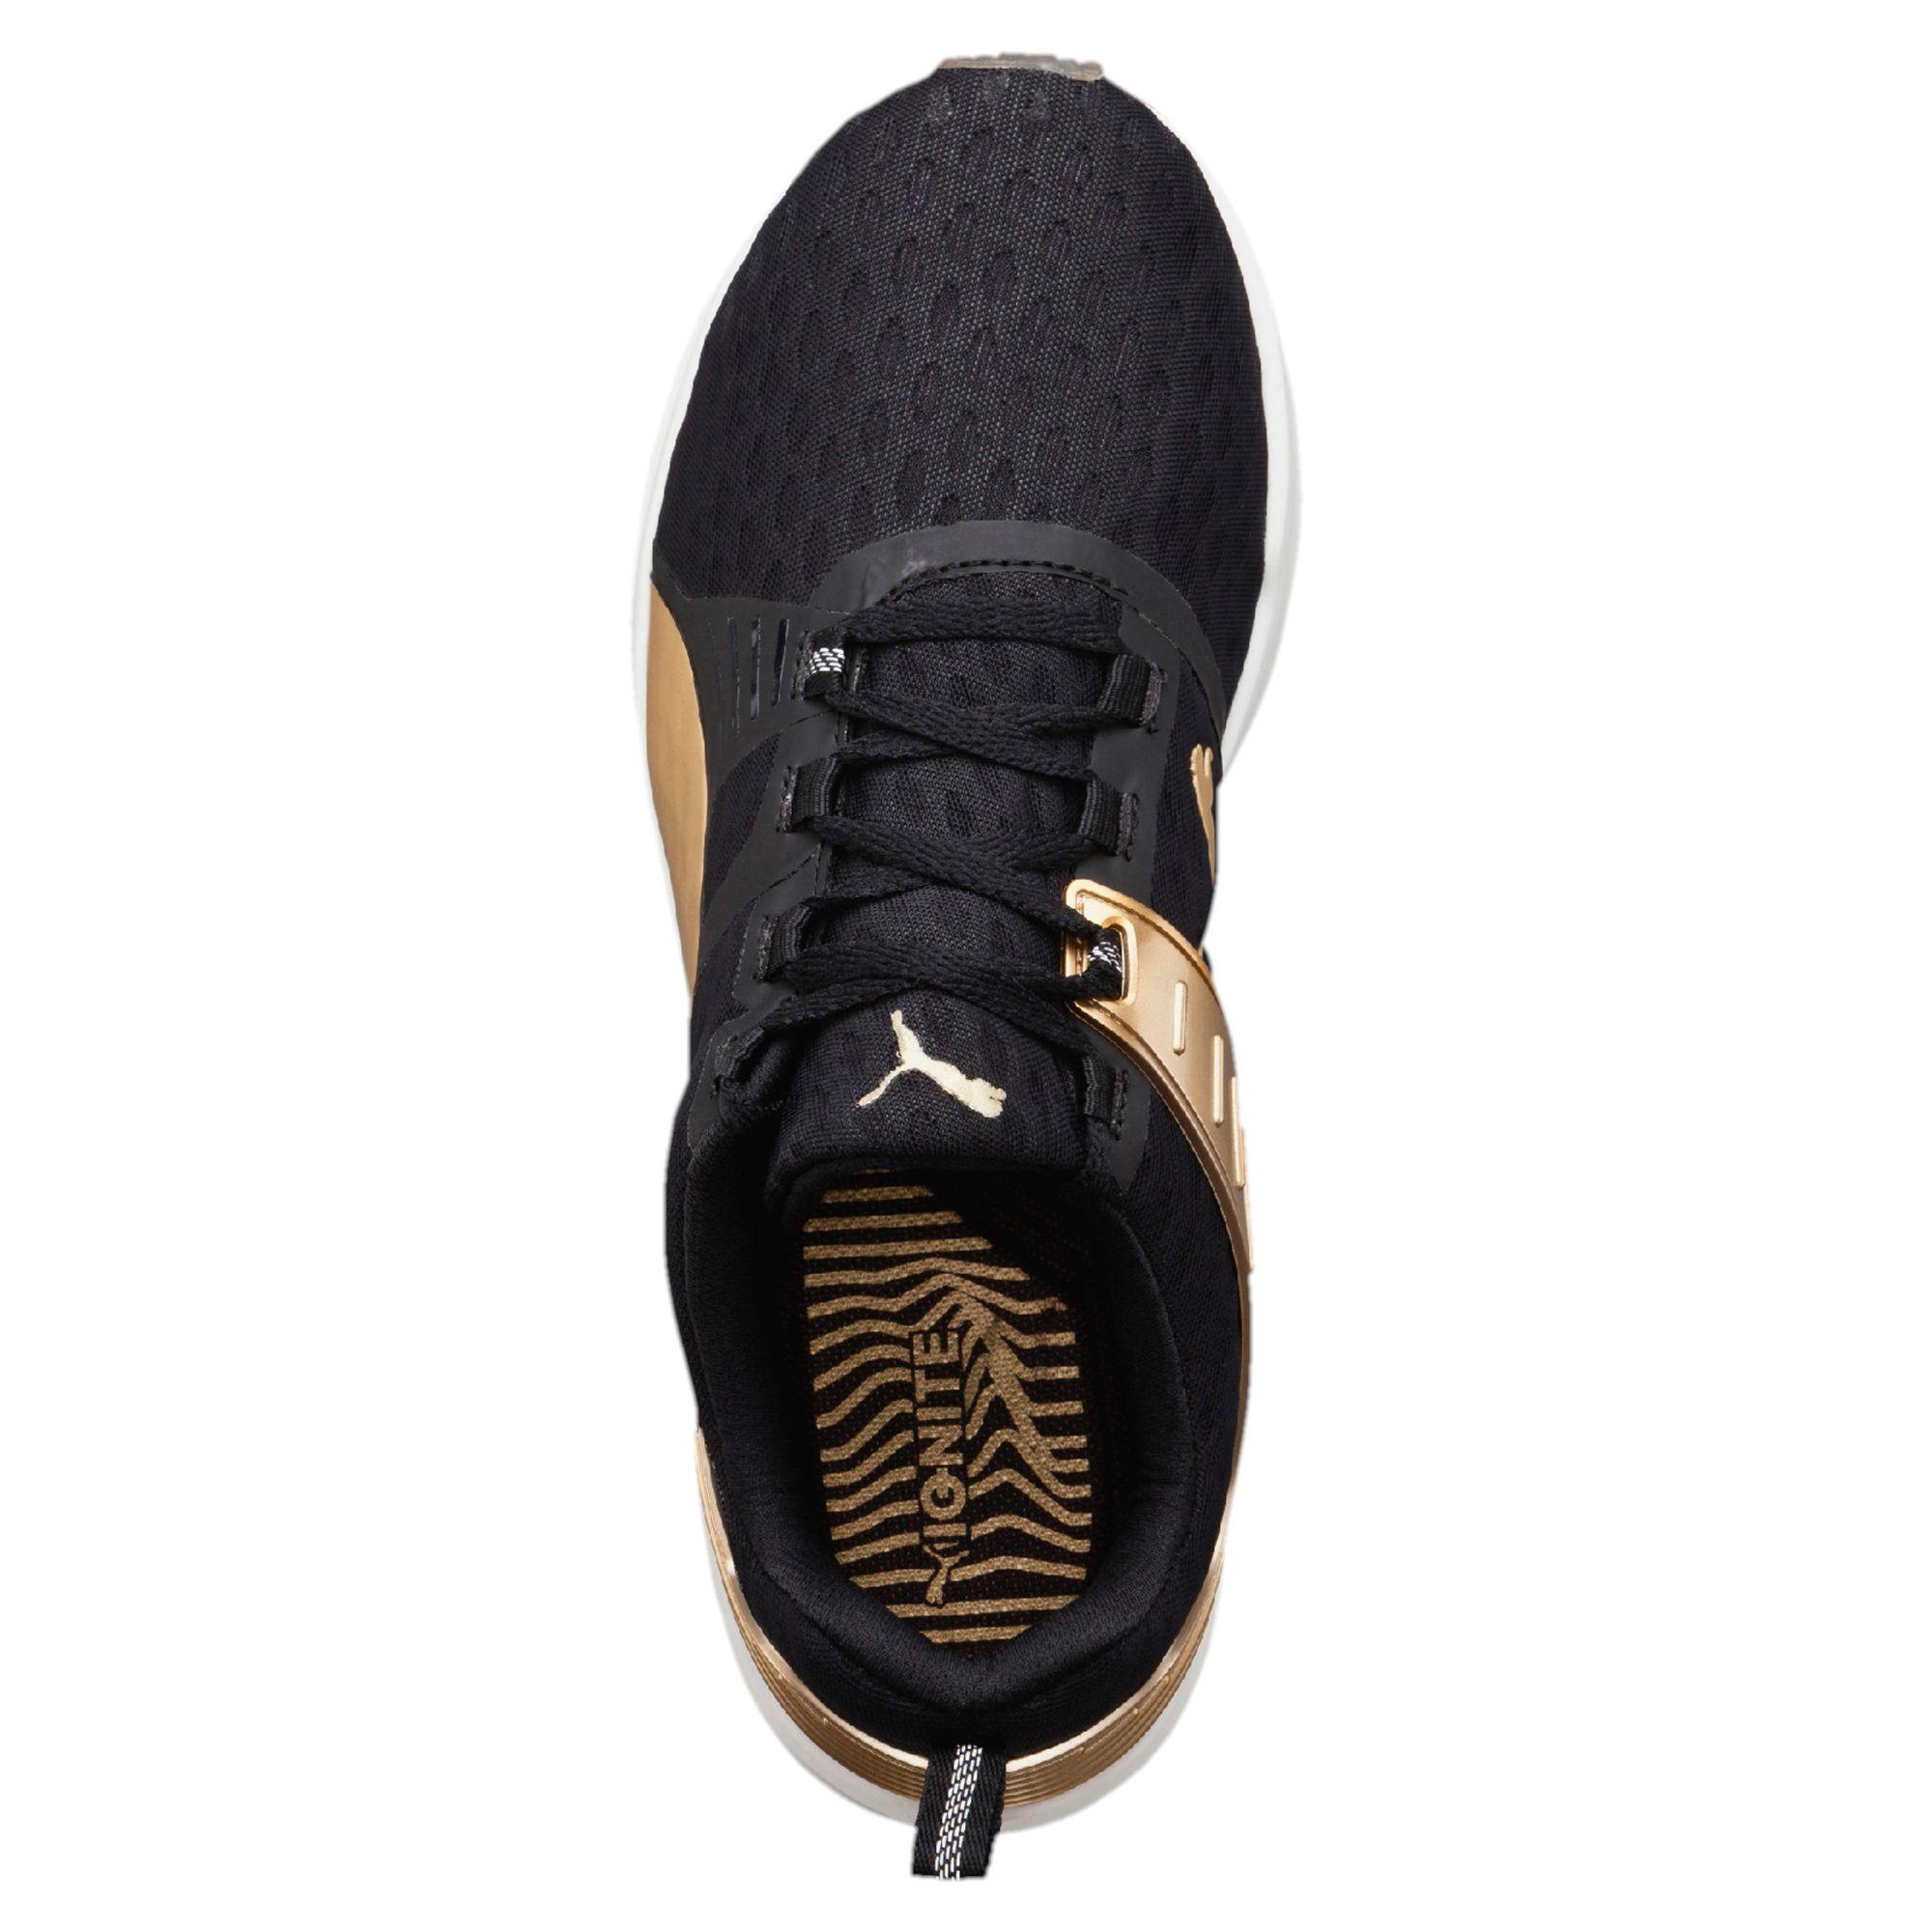 c2960ab9e0a8 Lyst - PUMA Ignite Xt V2 Gold Women s Training Shoes